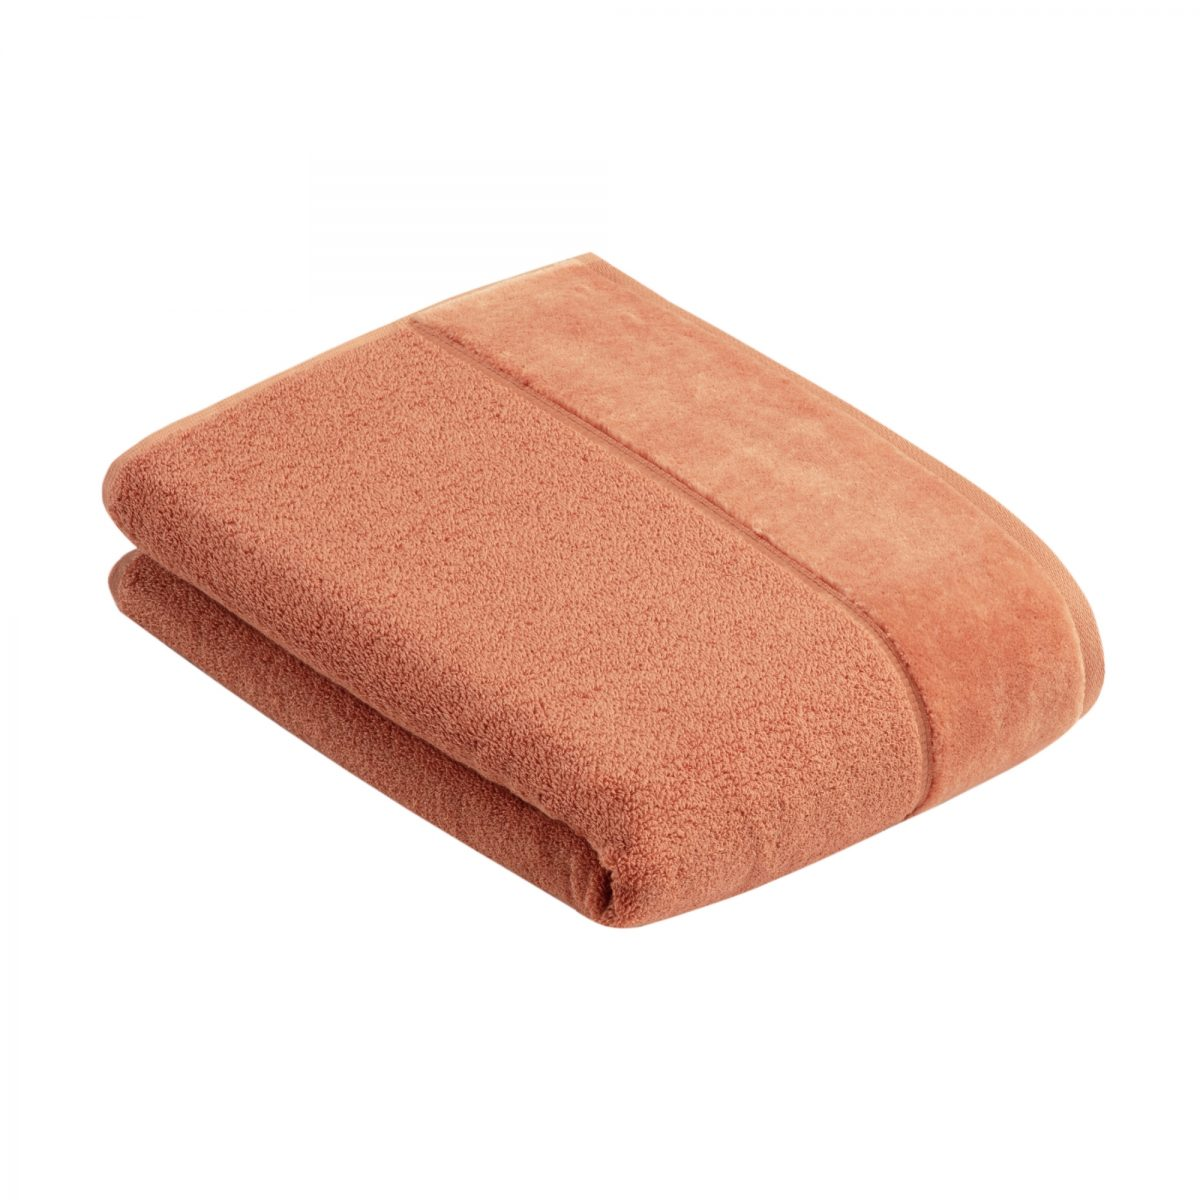 Bronze bath towel